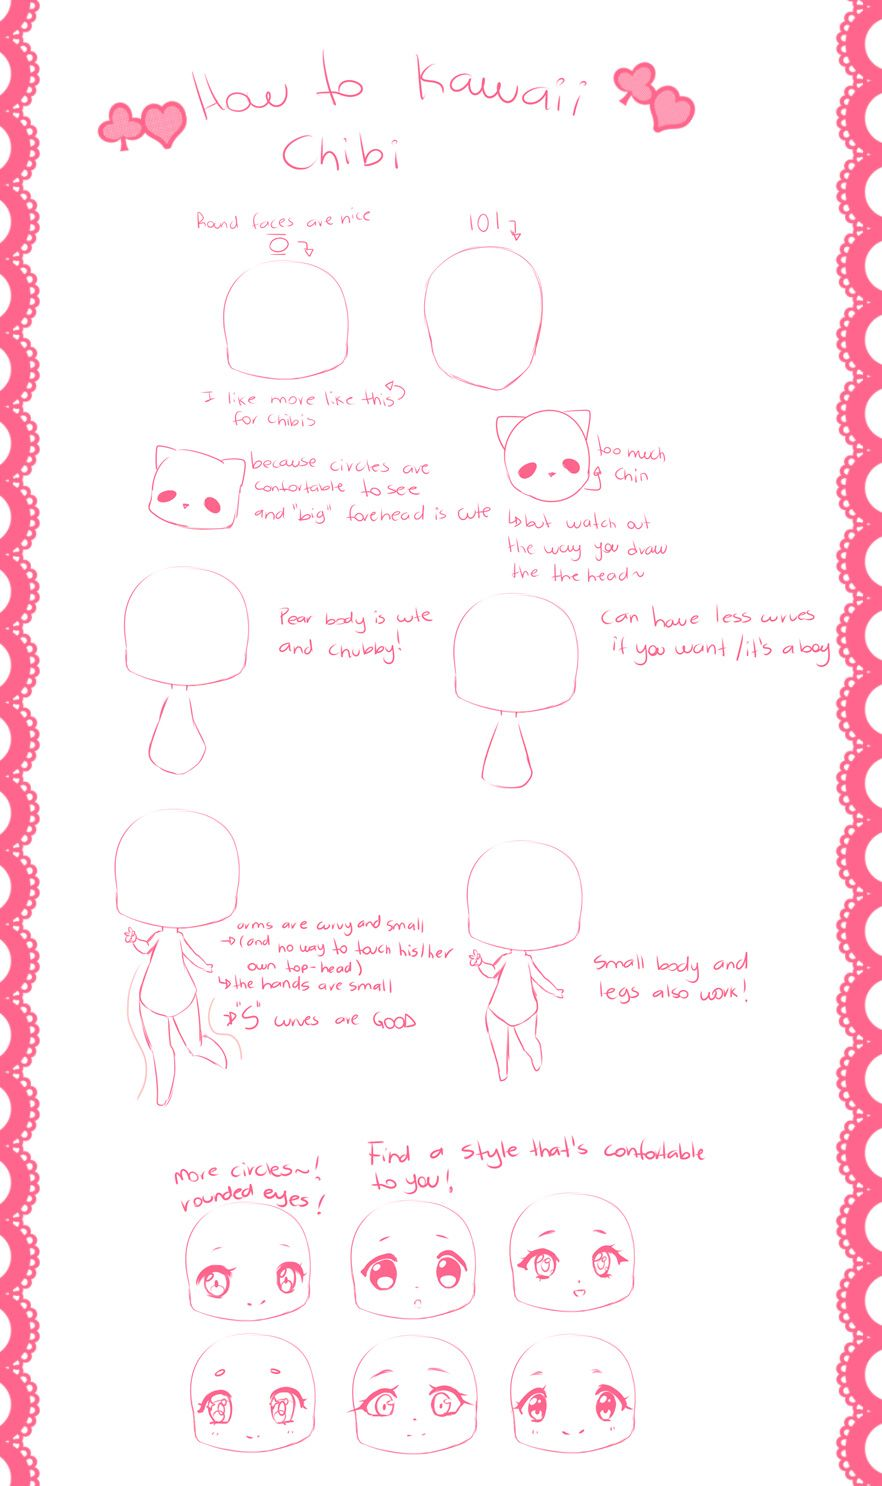 How To Kawaii Chibi By Hyanna Natsu Kawaii Chibi Chibi Manga Drawing Tutorials